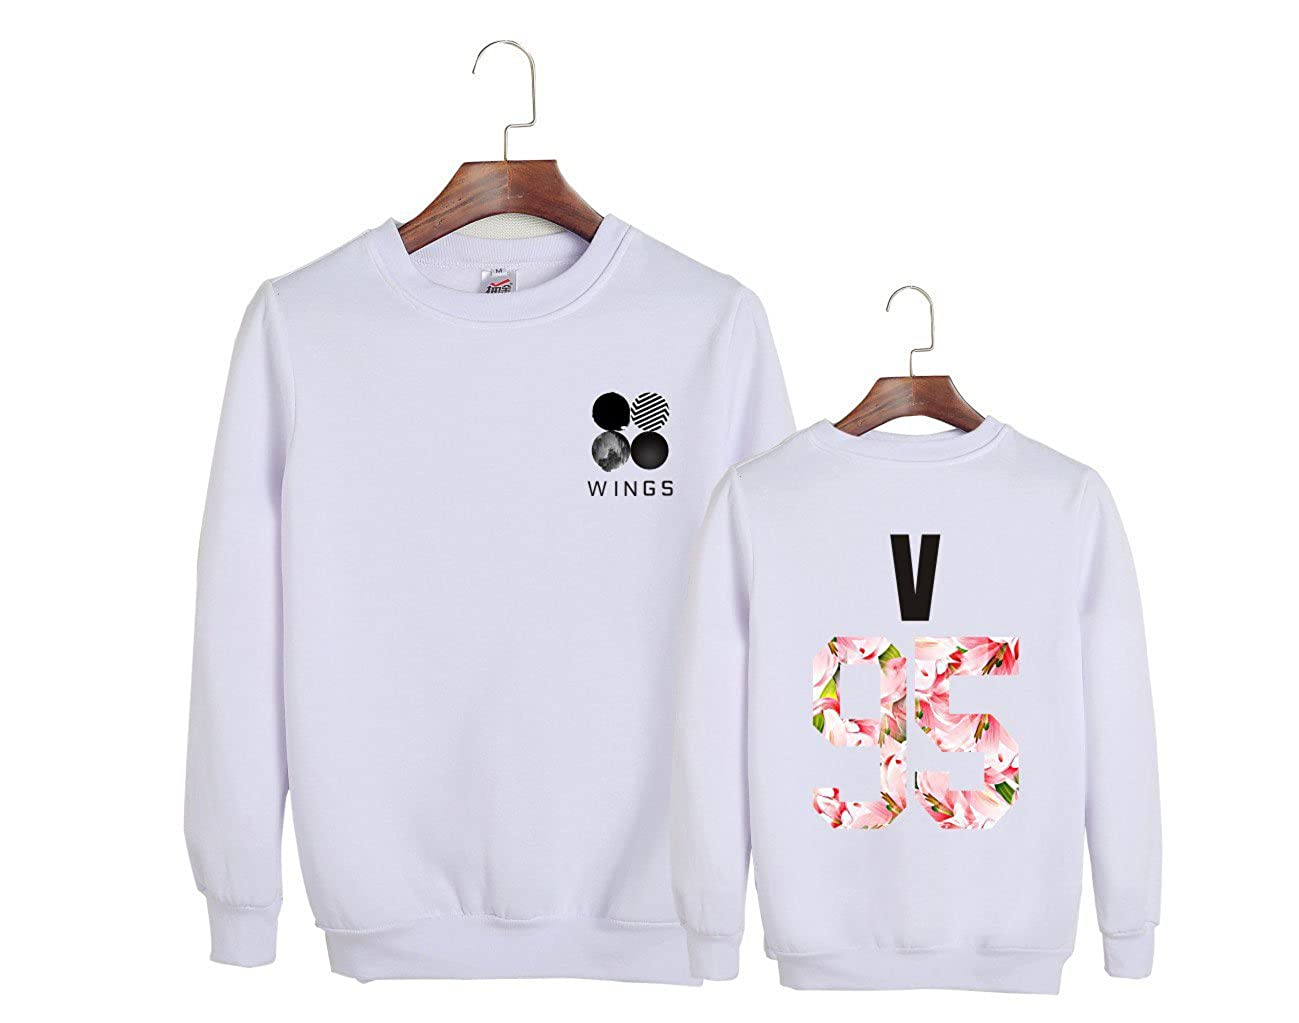 ALLDECOR Kpop Group BangtanBoys BTS V Fans Round Neck Sweatshirt Unisex Hoodies